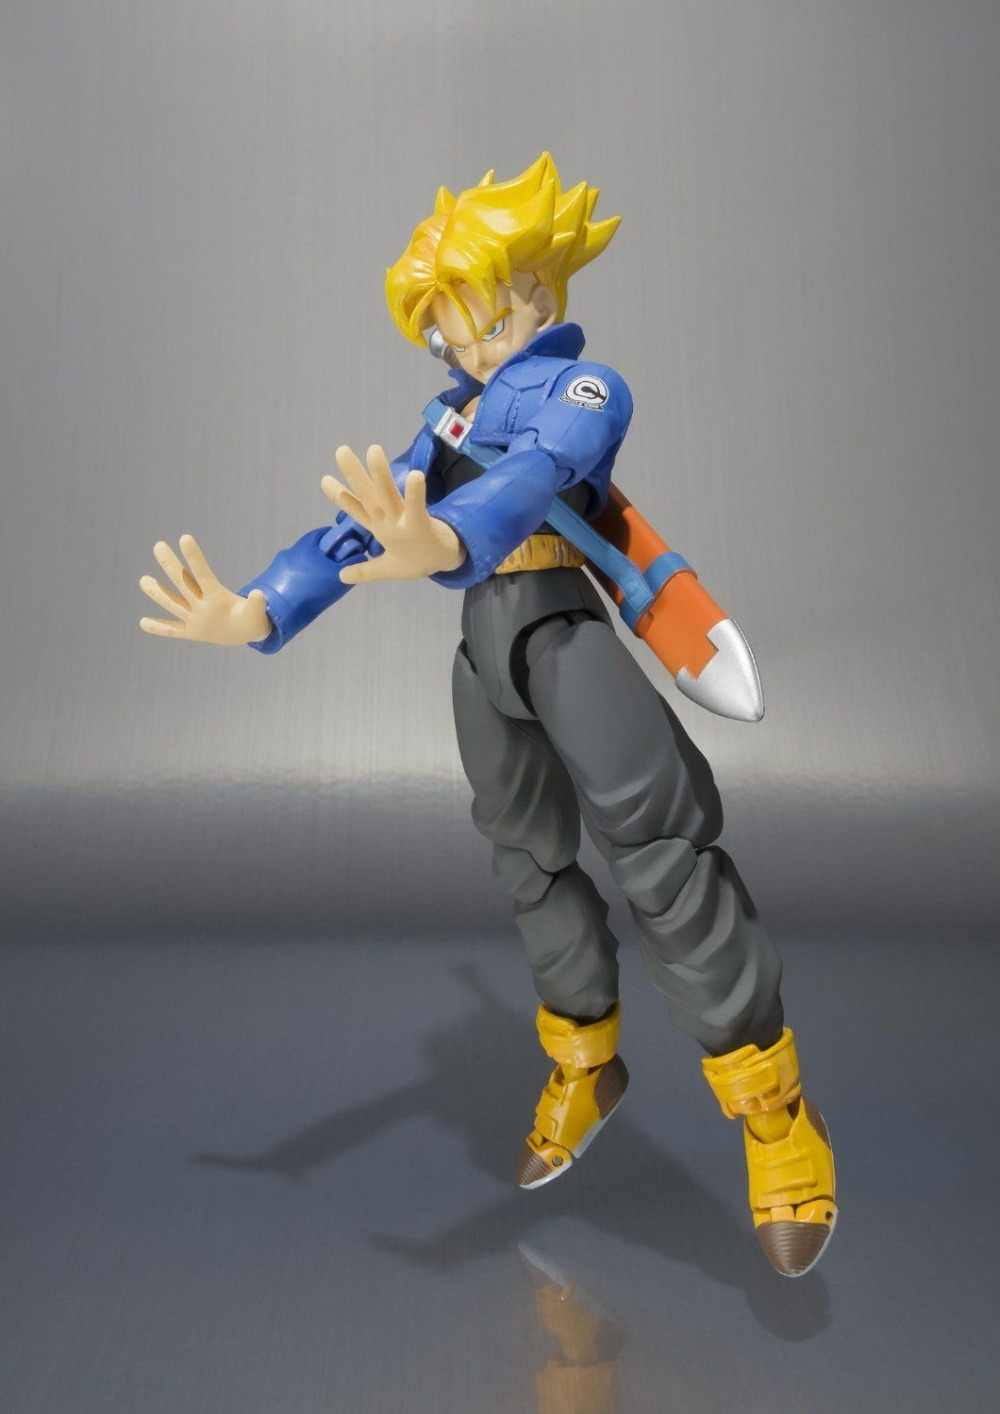 "100% Originele Bandai Tamashii Naties S.H.Figuarts (Shf) Action Figure - Trunks Premium Kleur Editie Van ""Dragon Ball Z"""